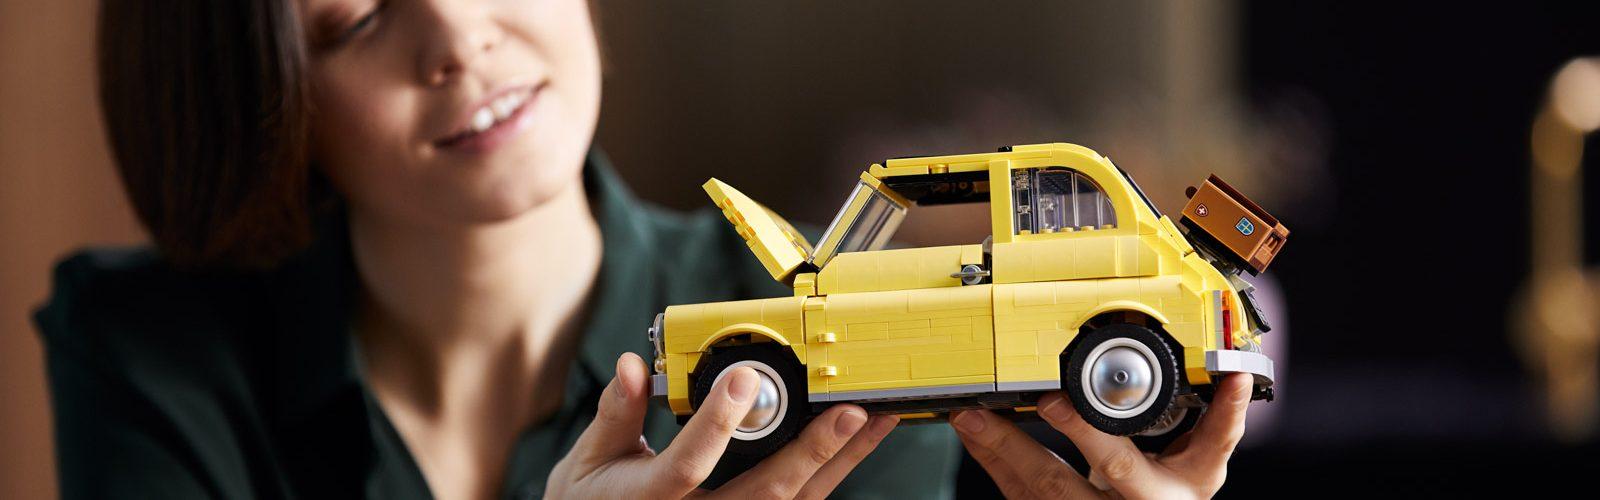 Lego 10271 Fiat 500 06